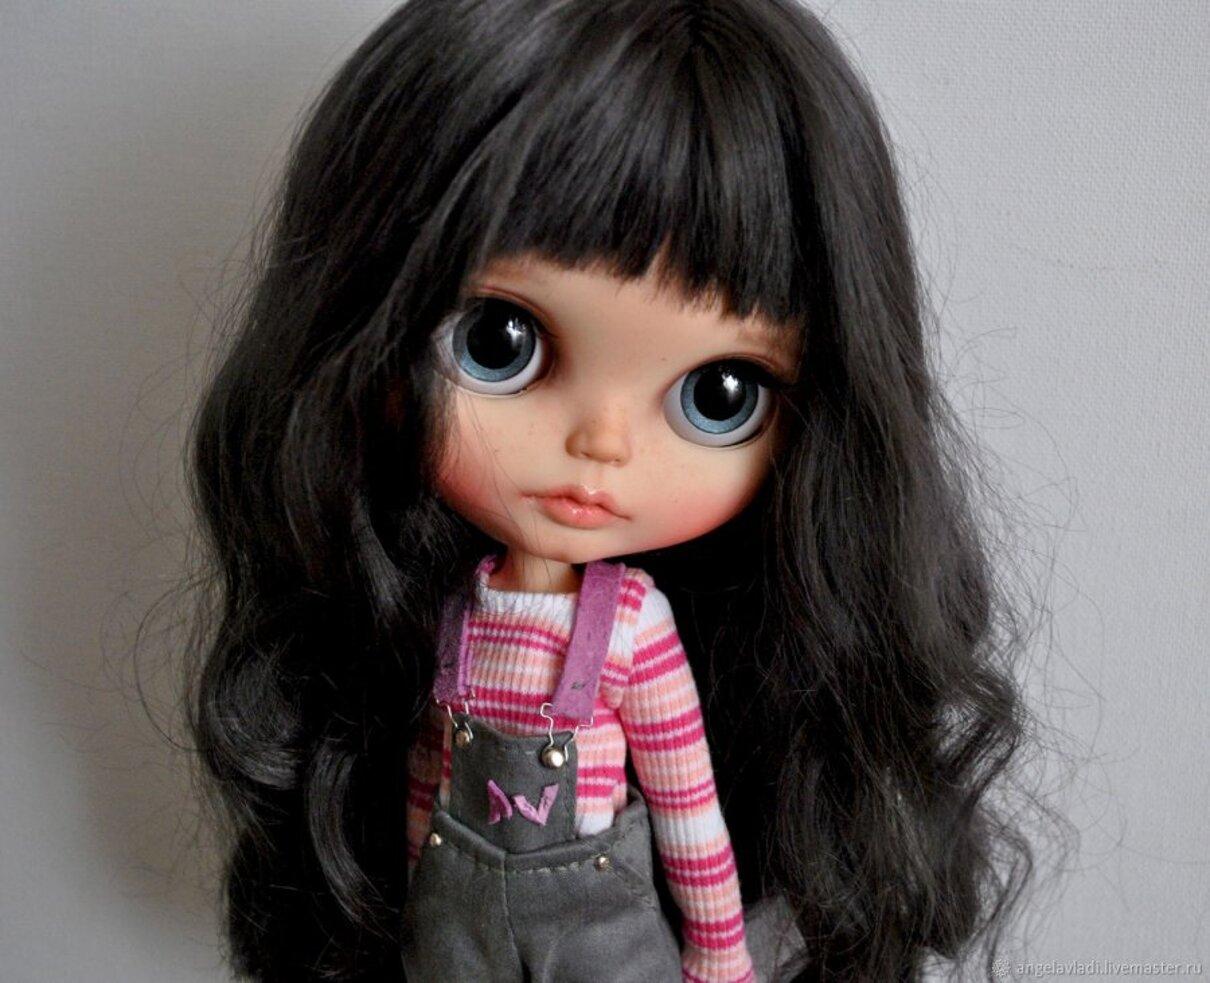 Жалоба-отзыв: Kukla-collection.ru - Кукла Blythe